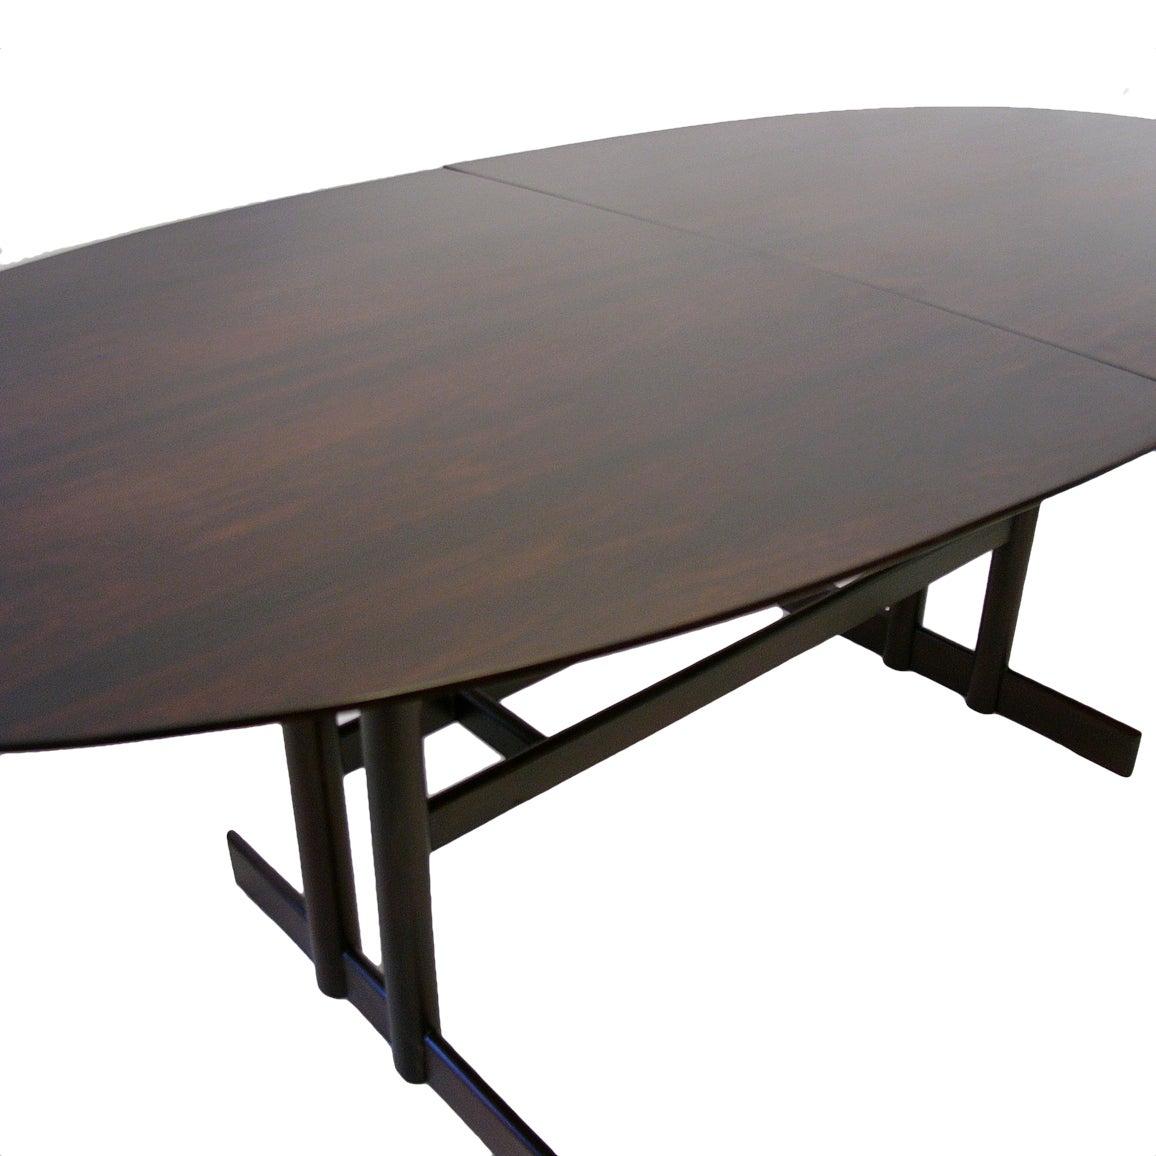 Jacaranda Oval Dining Table By LAtelier Brazilian